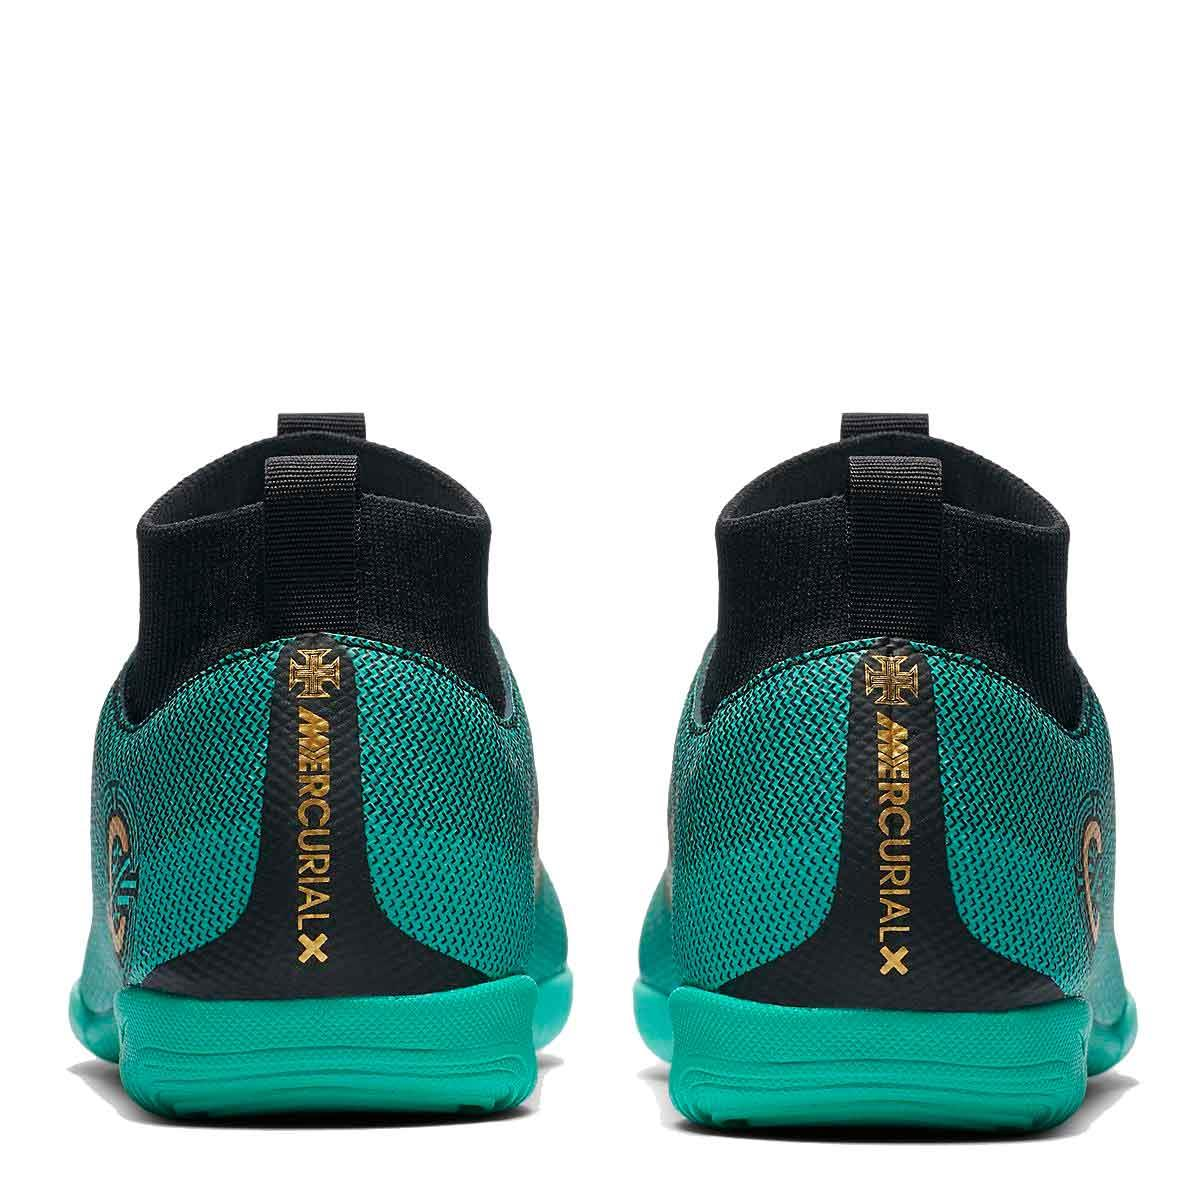 4f8b90f26e Chuteira Futsal Nike MercurialX Superfly 6 Academy CR7 Infantil